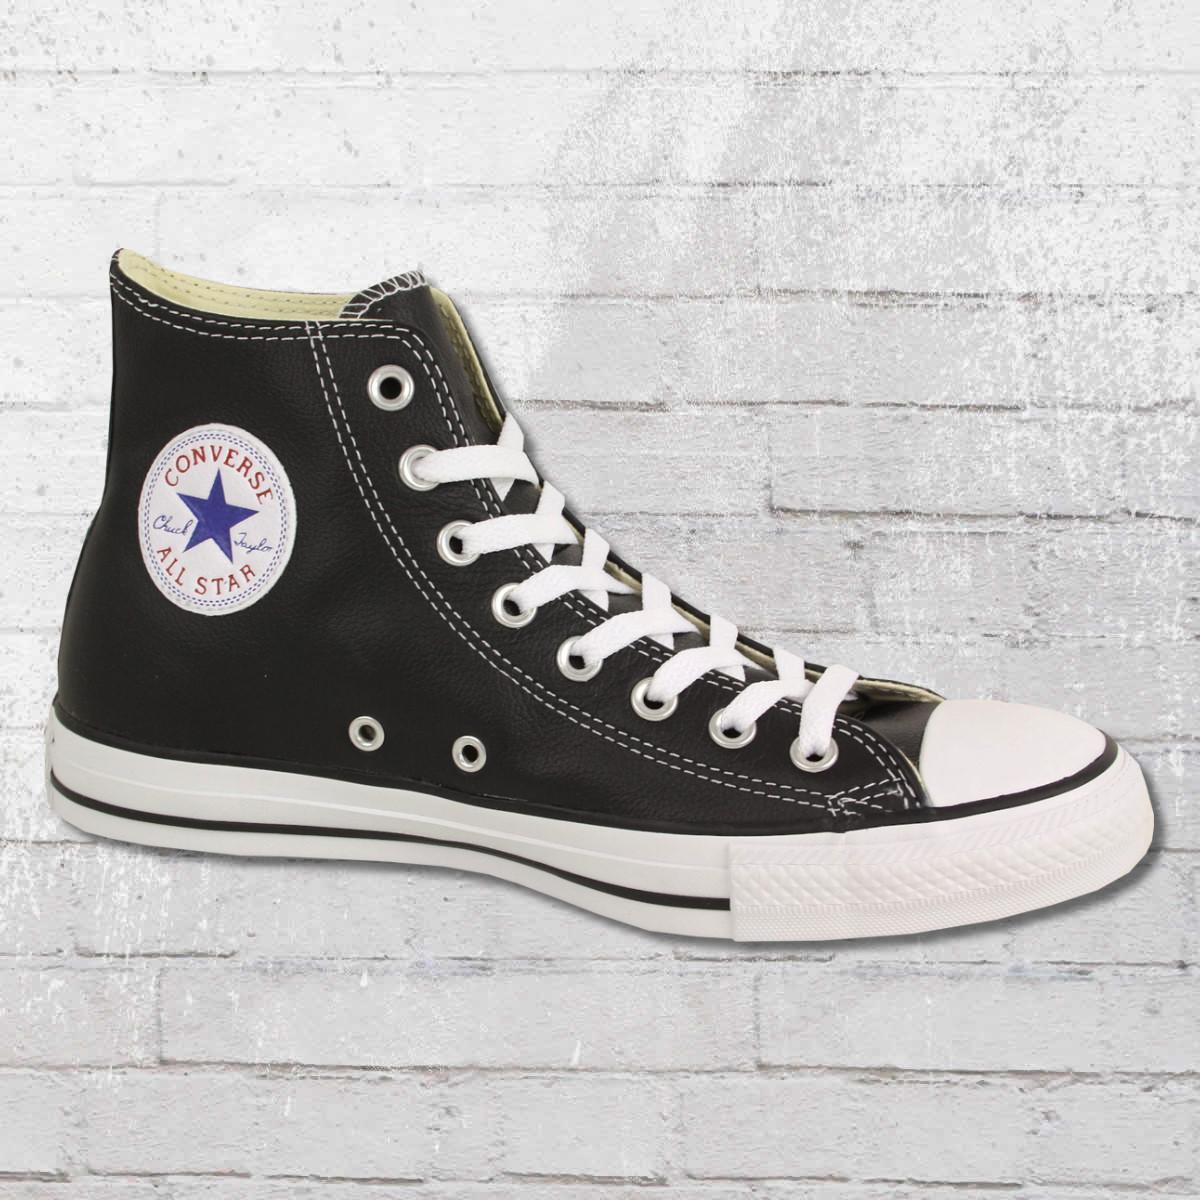 2f56d32ec3e3 Converse Chucks Leather Shoes132170 C black. ›‹ «